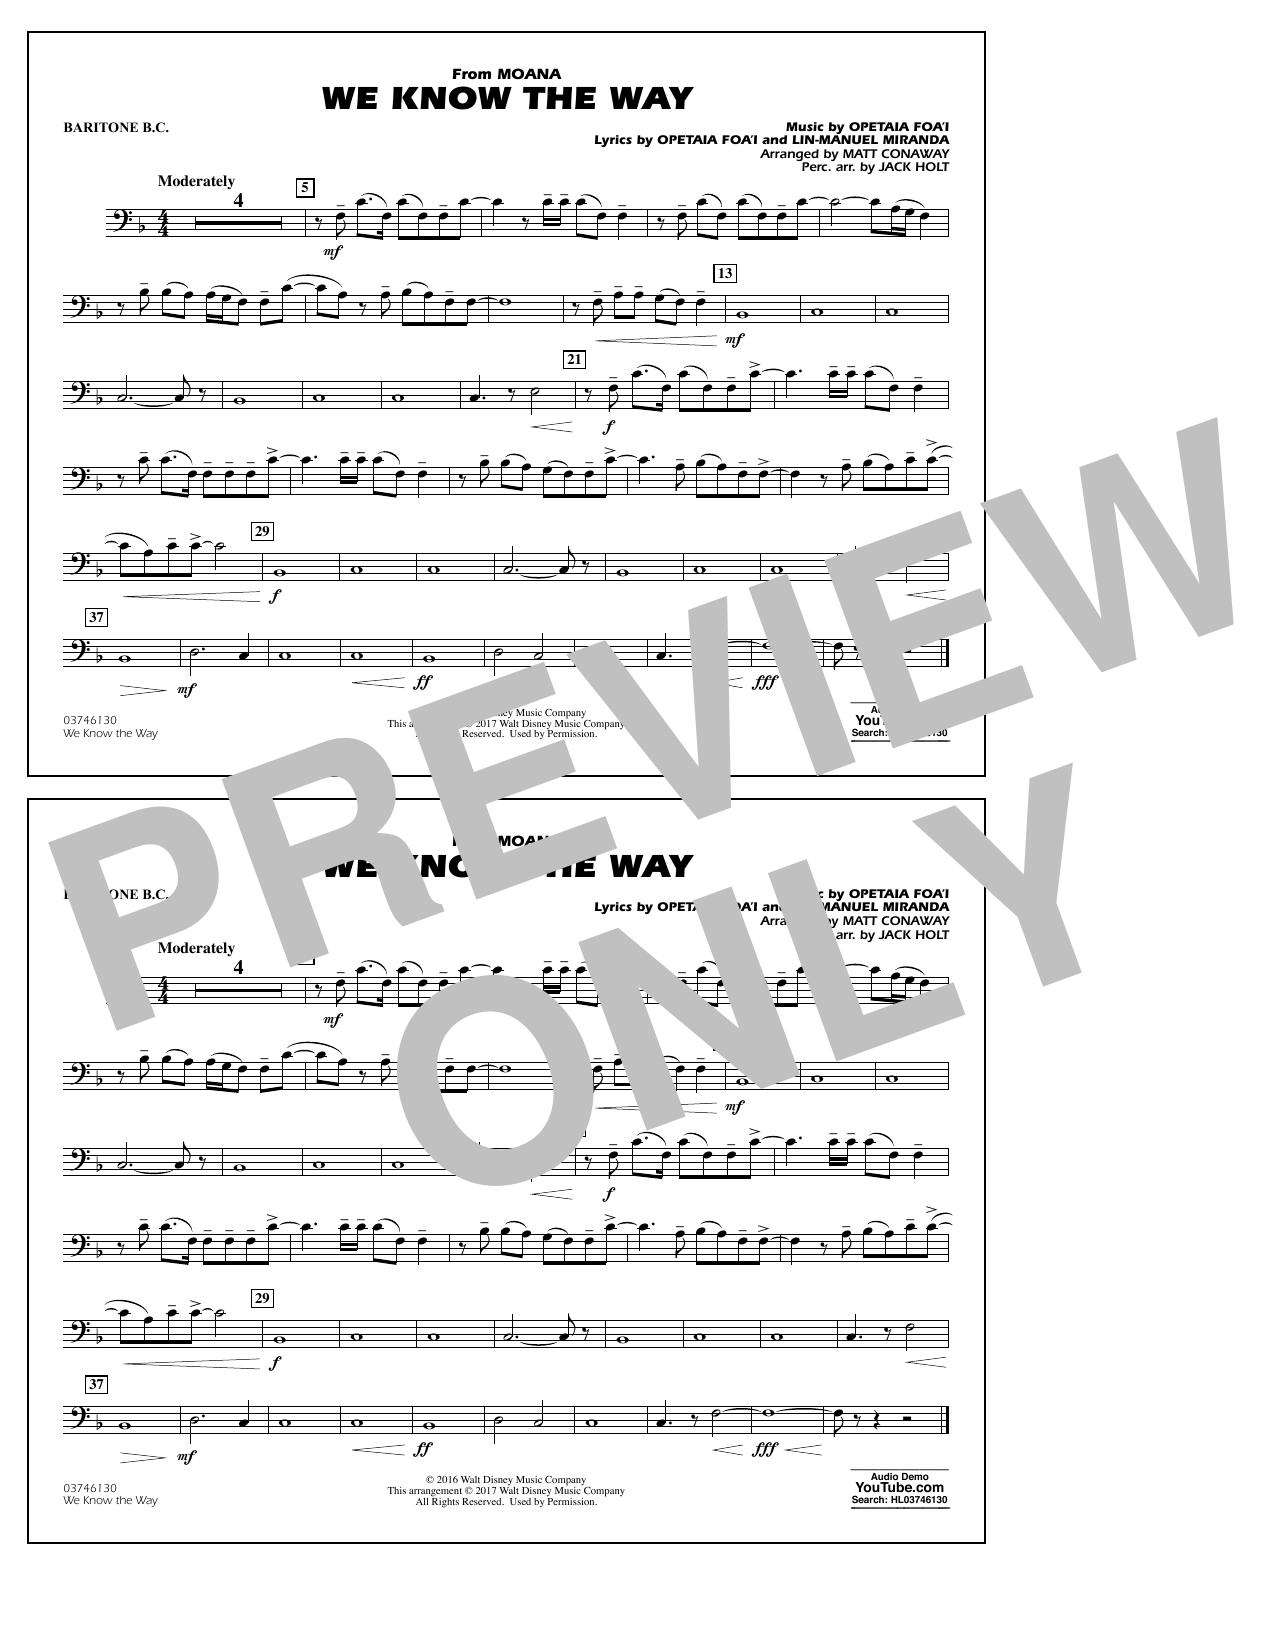 We Know the Way (from Moana) - Baritone B.C. Sheet Music